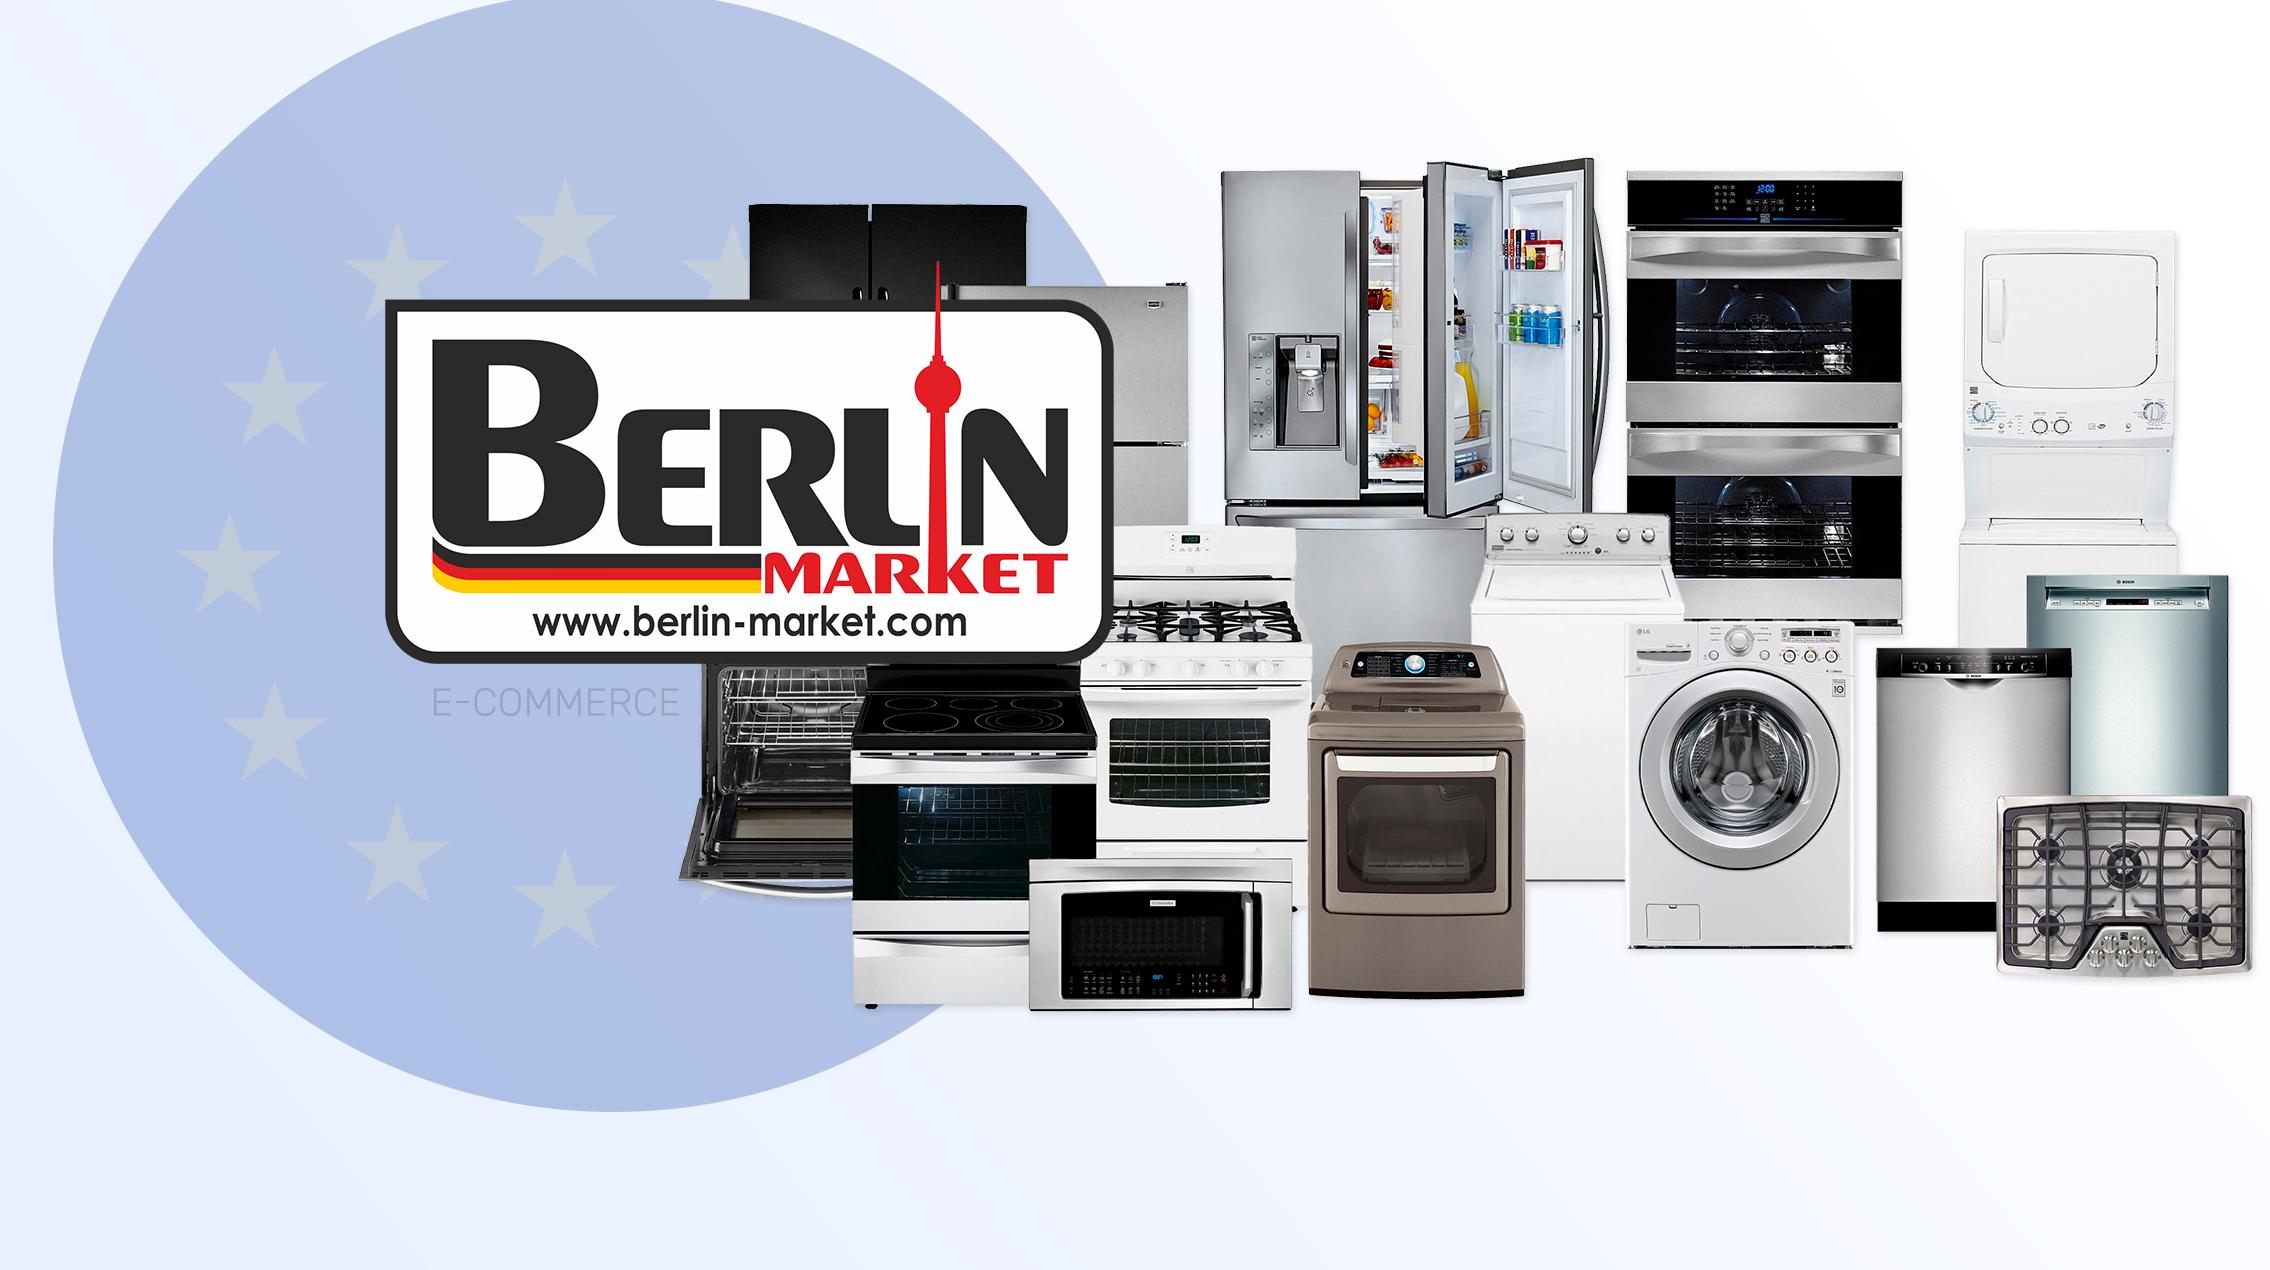 Создание интернет магазина Berlin Market